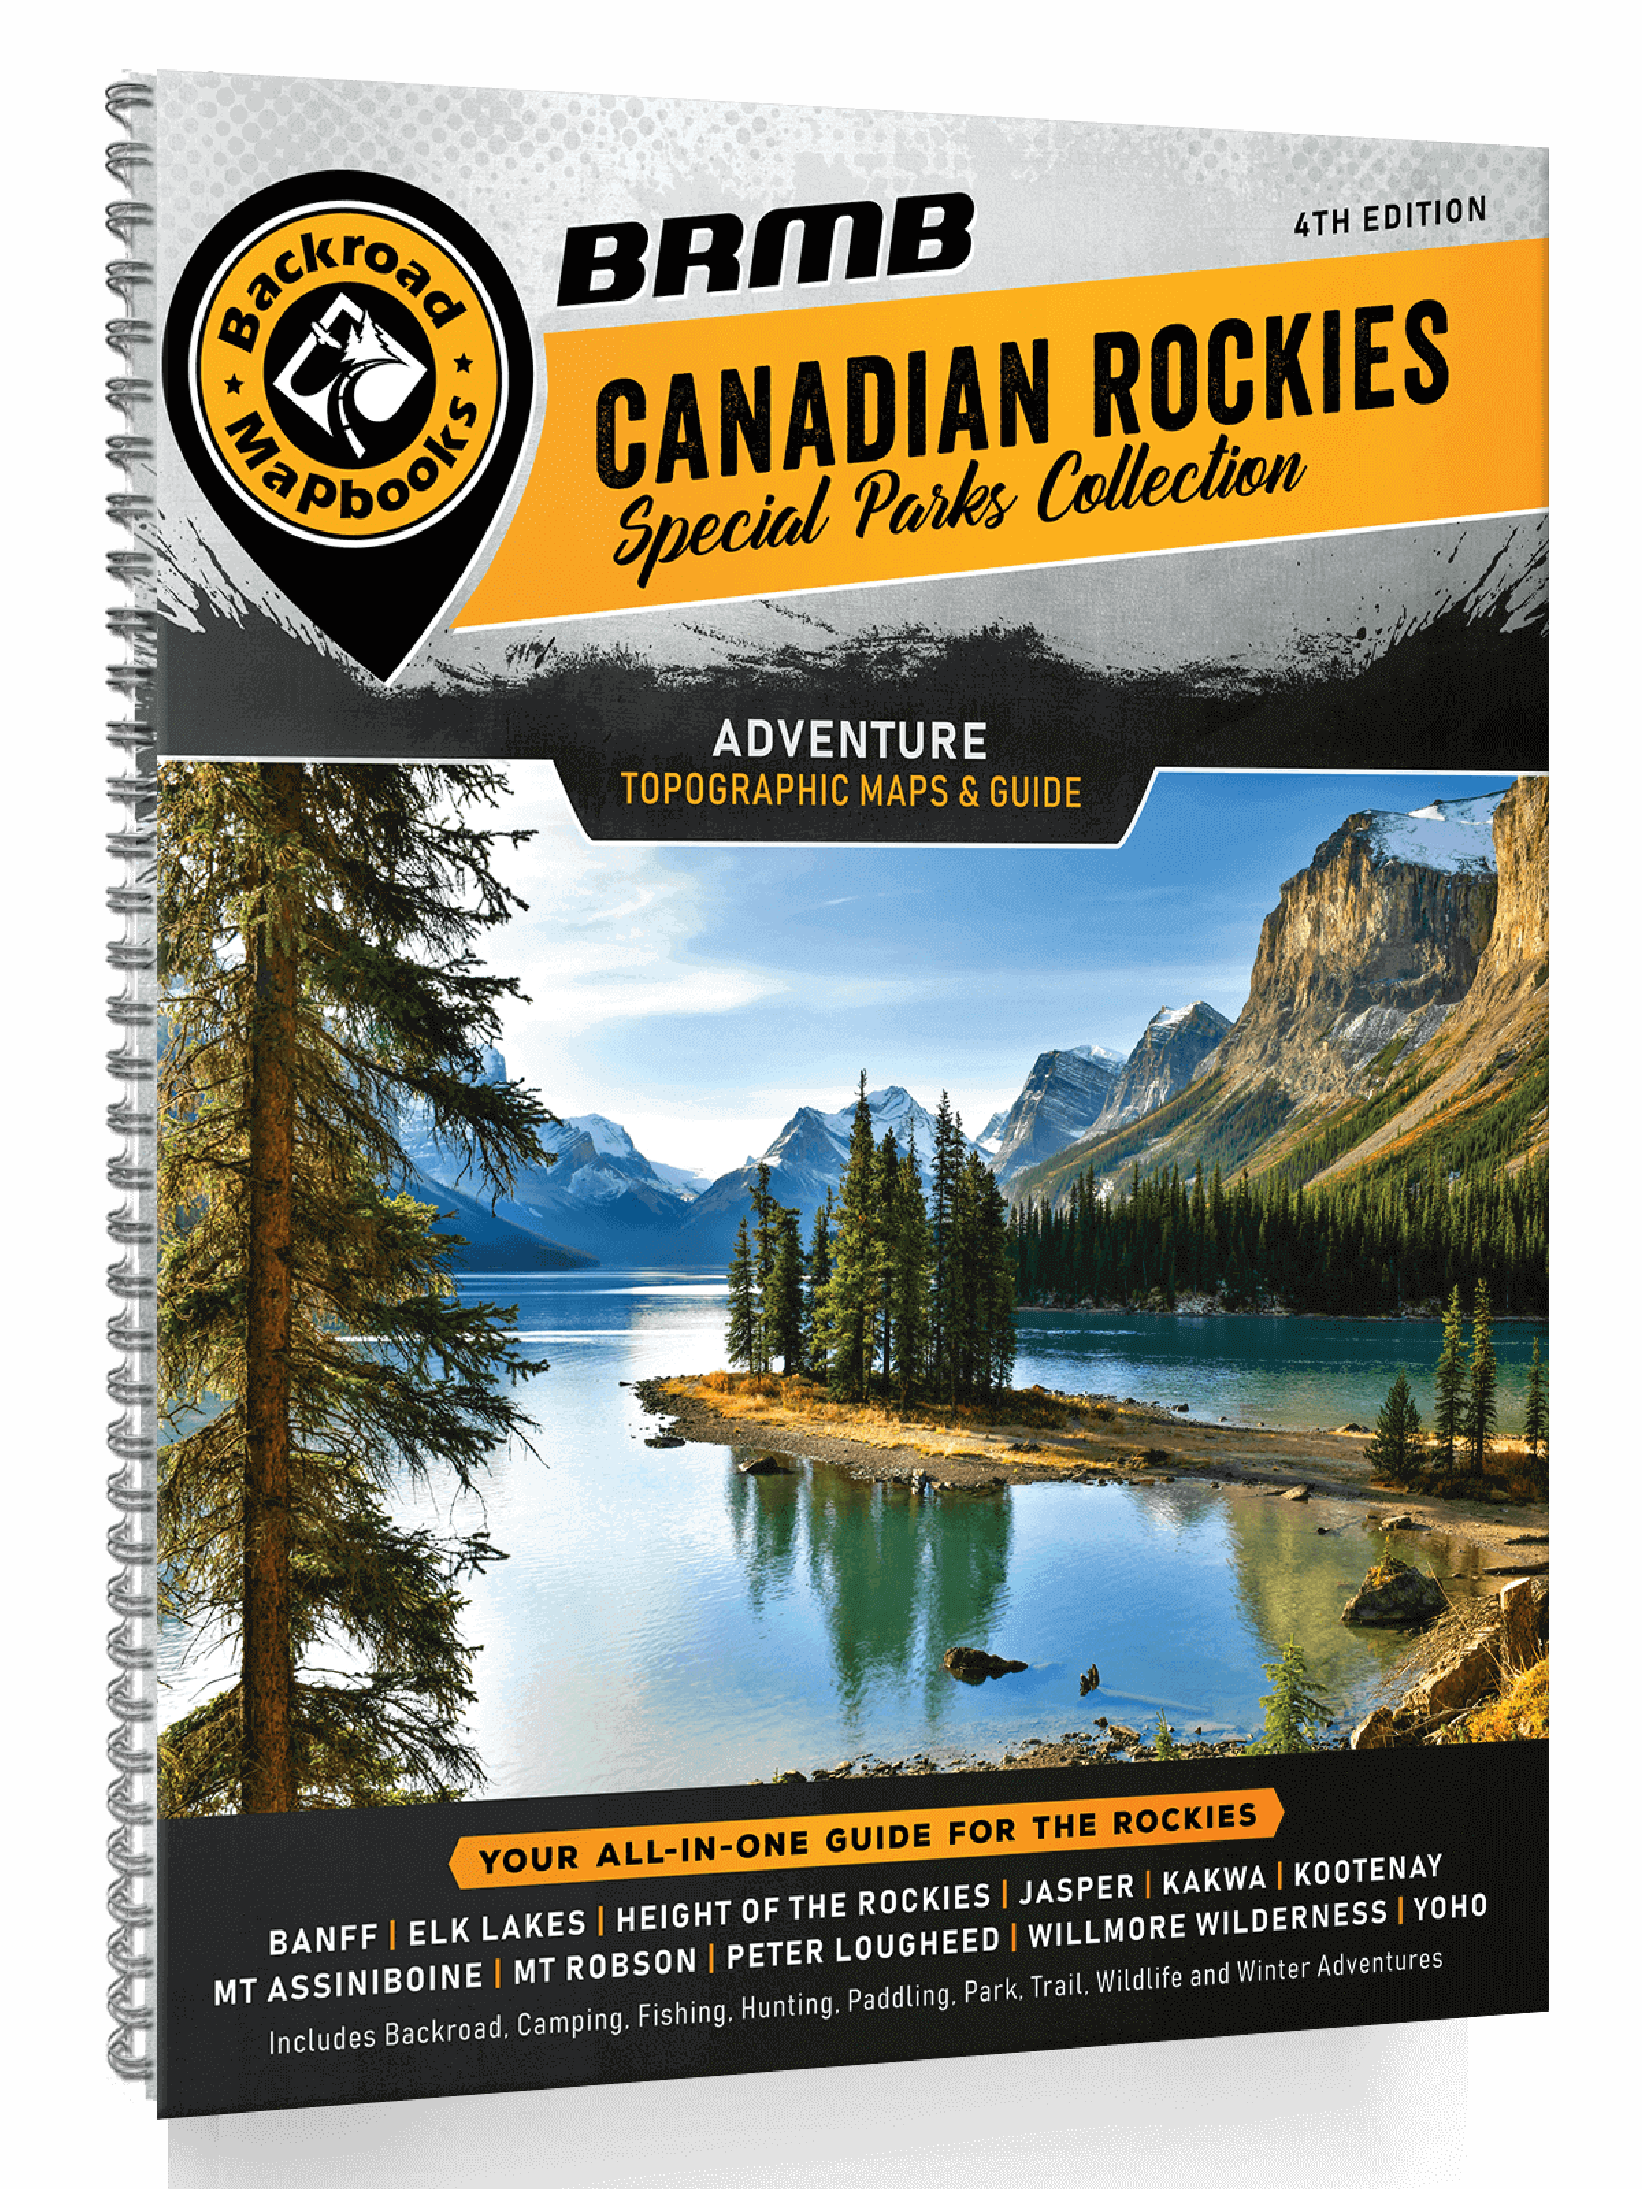 Canadian Rockies - 4th Edition